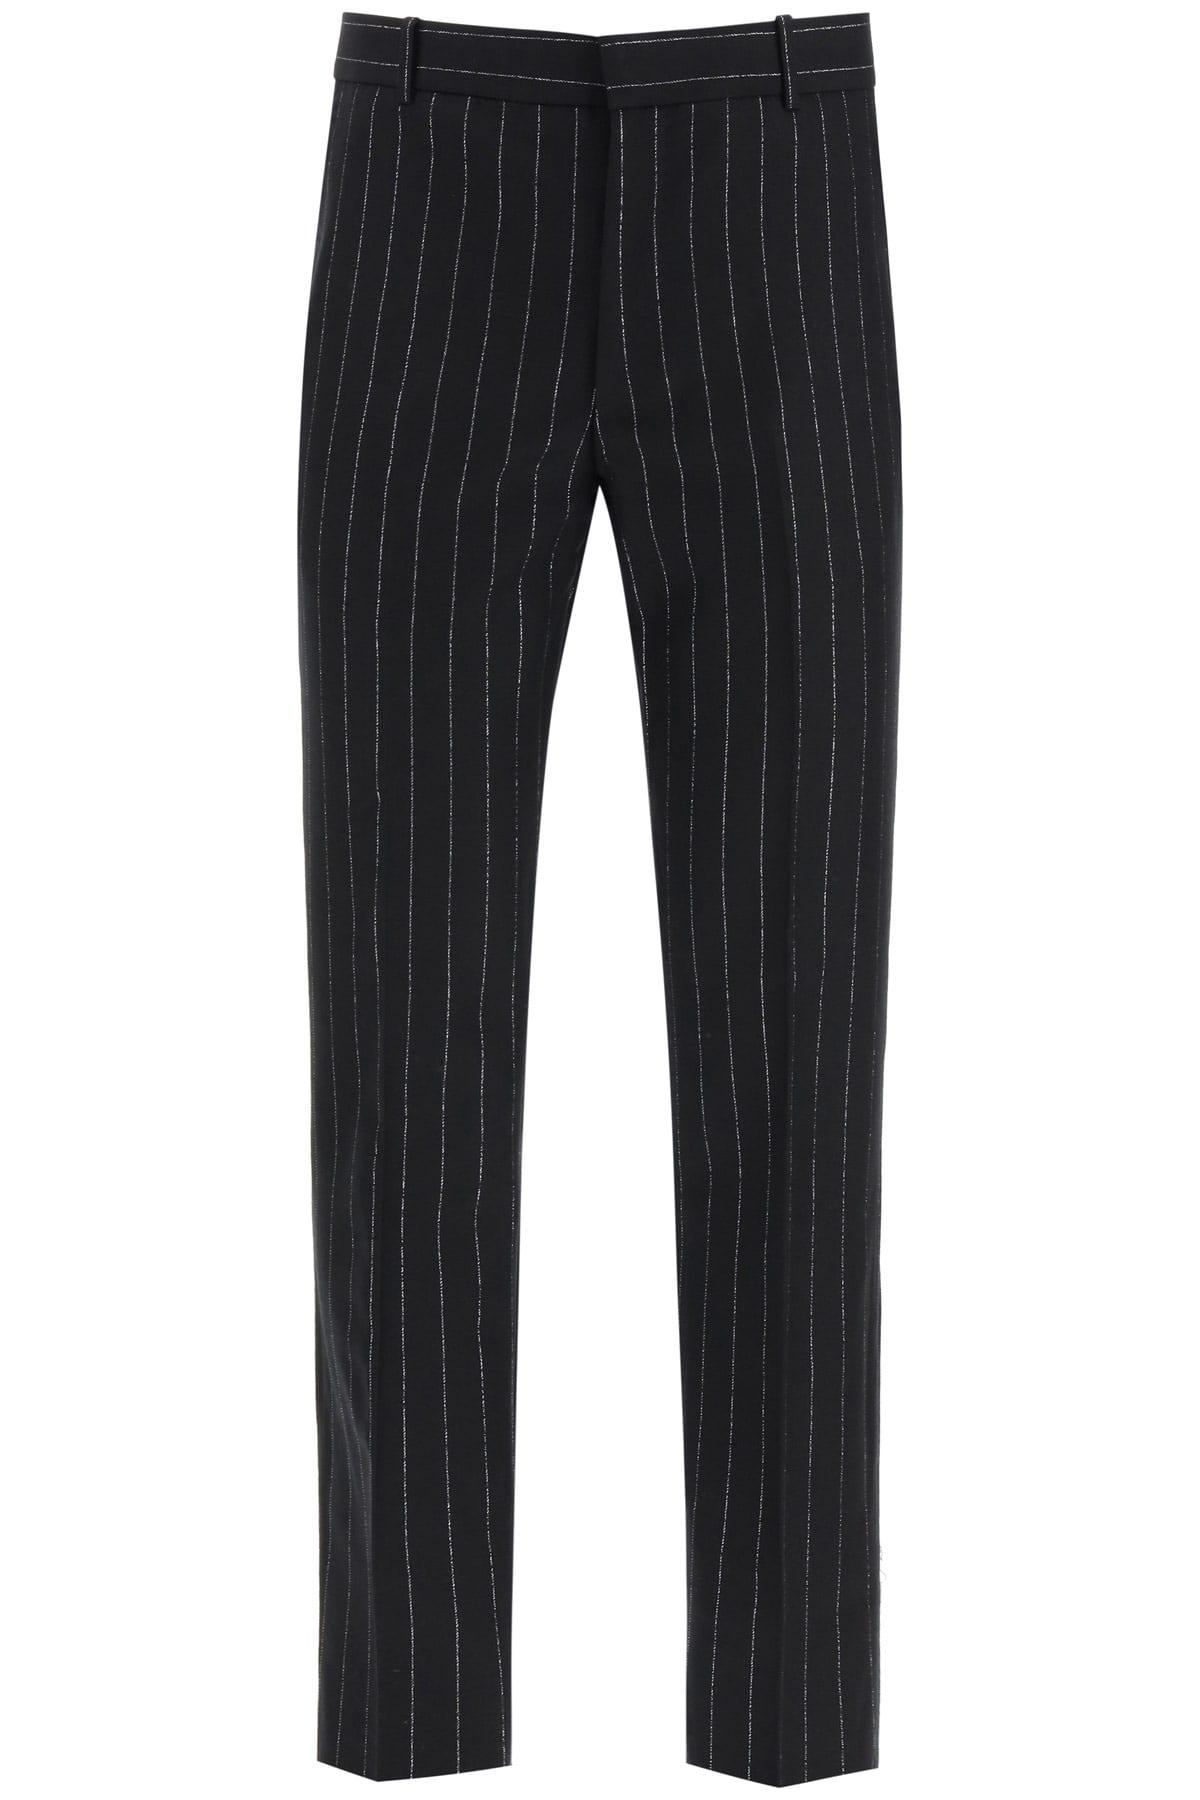 ALEXANDER MCQUEEN LUREX PINSTRIPE WOOL TROUSERS 50 Black, Silver Wool